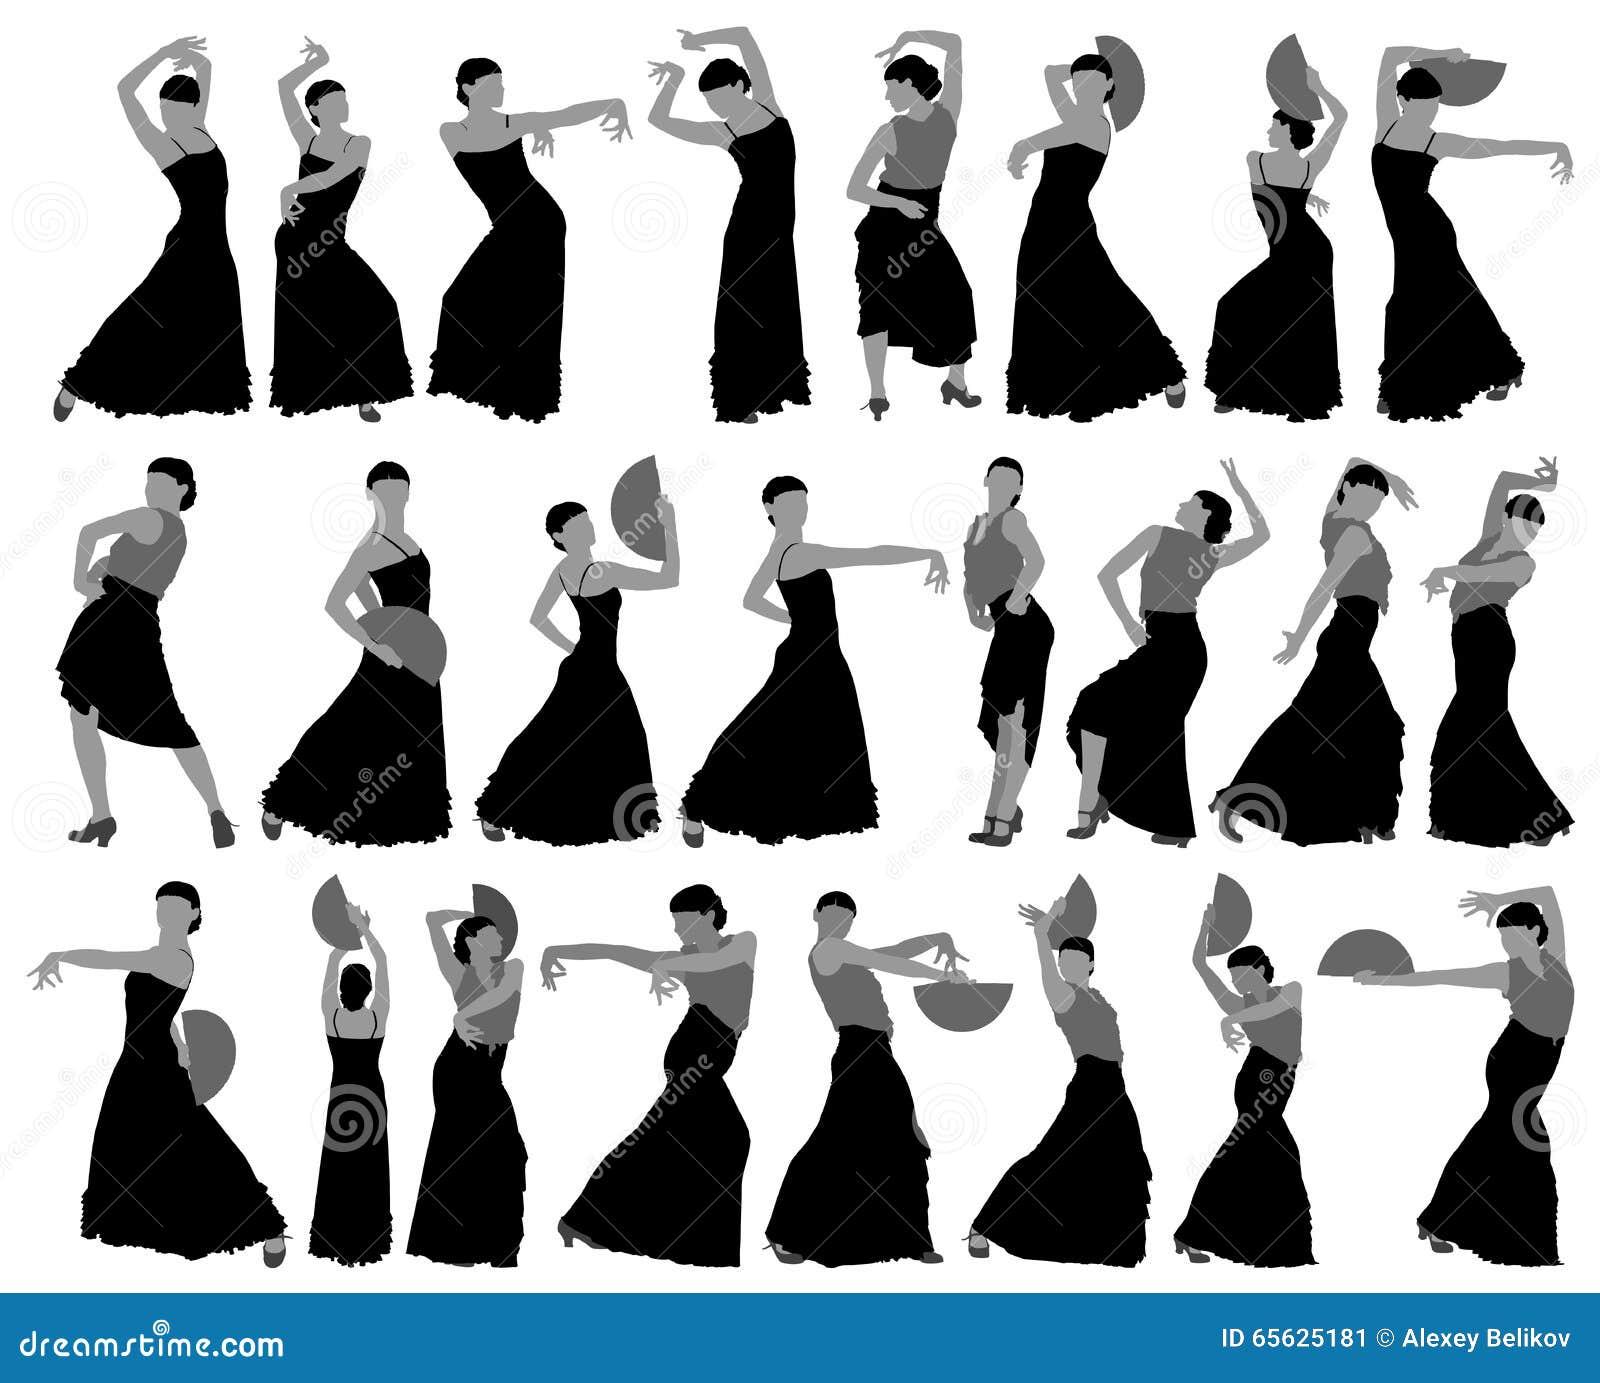 Silhouettes de danseur féminin de flamenco